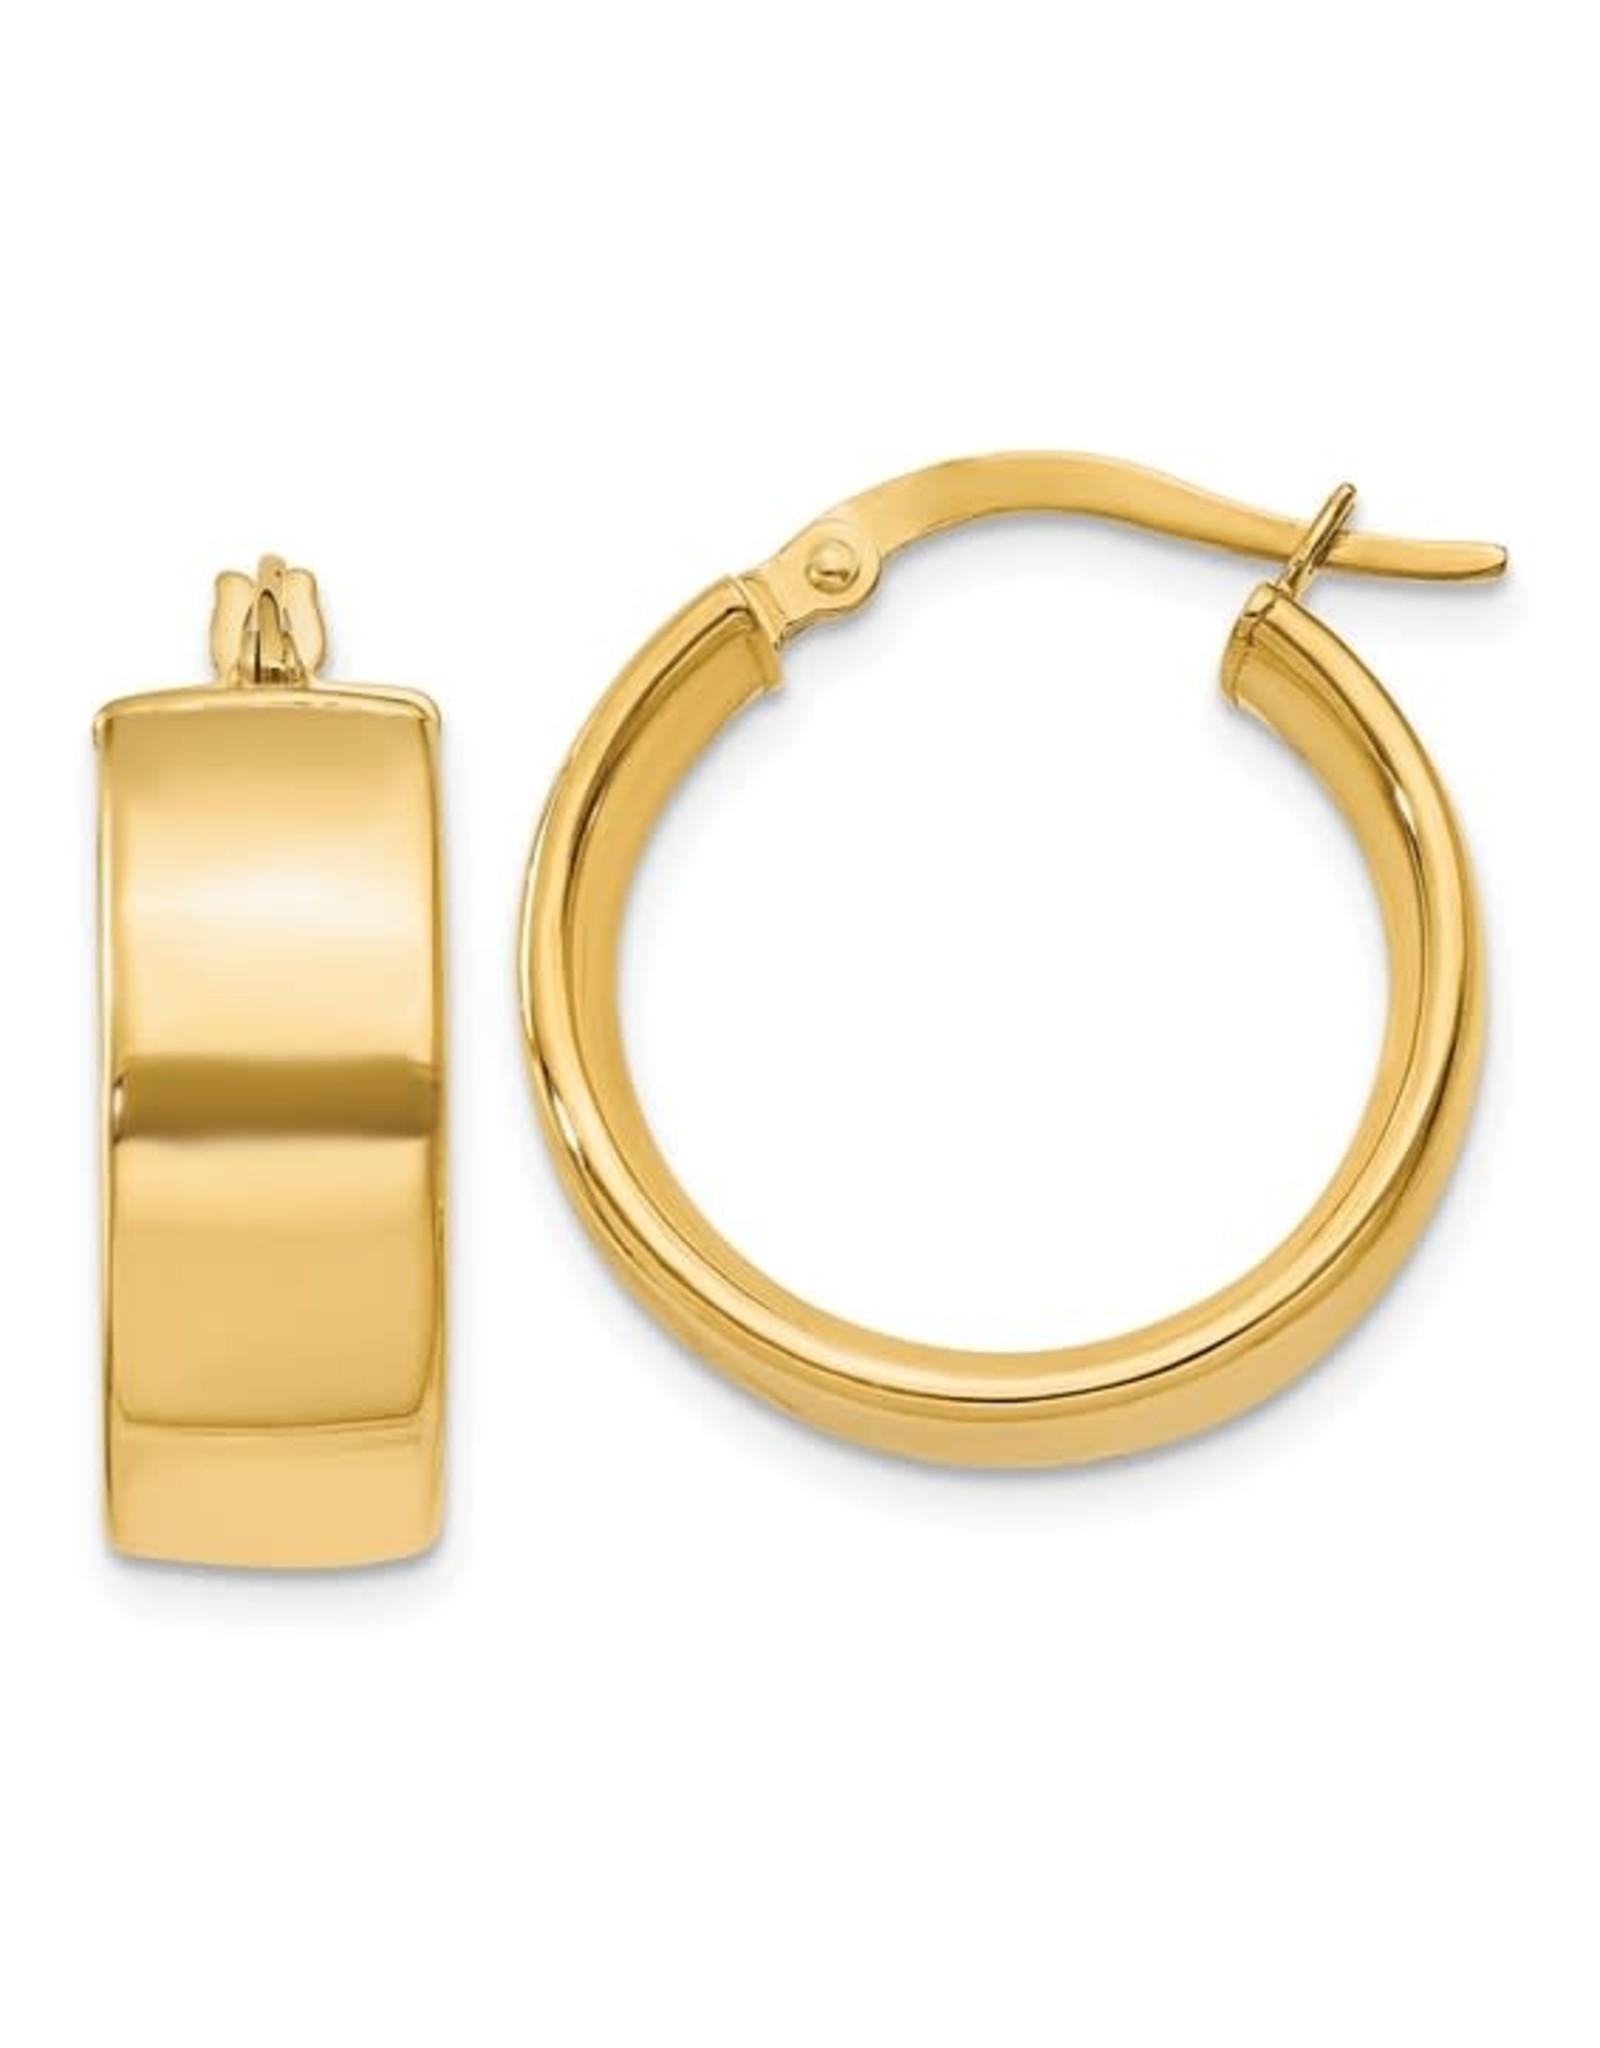 14K Yellow Gold Polished Chunky Hoop Earrings, 6mm